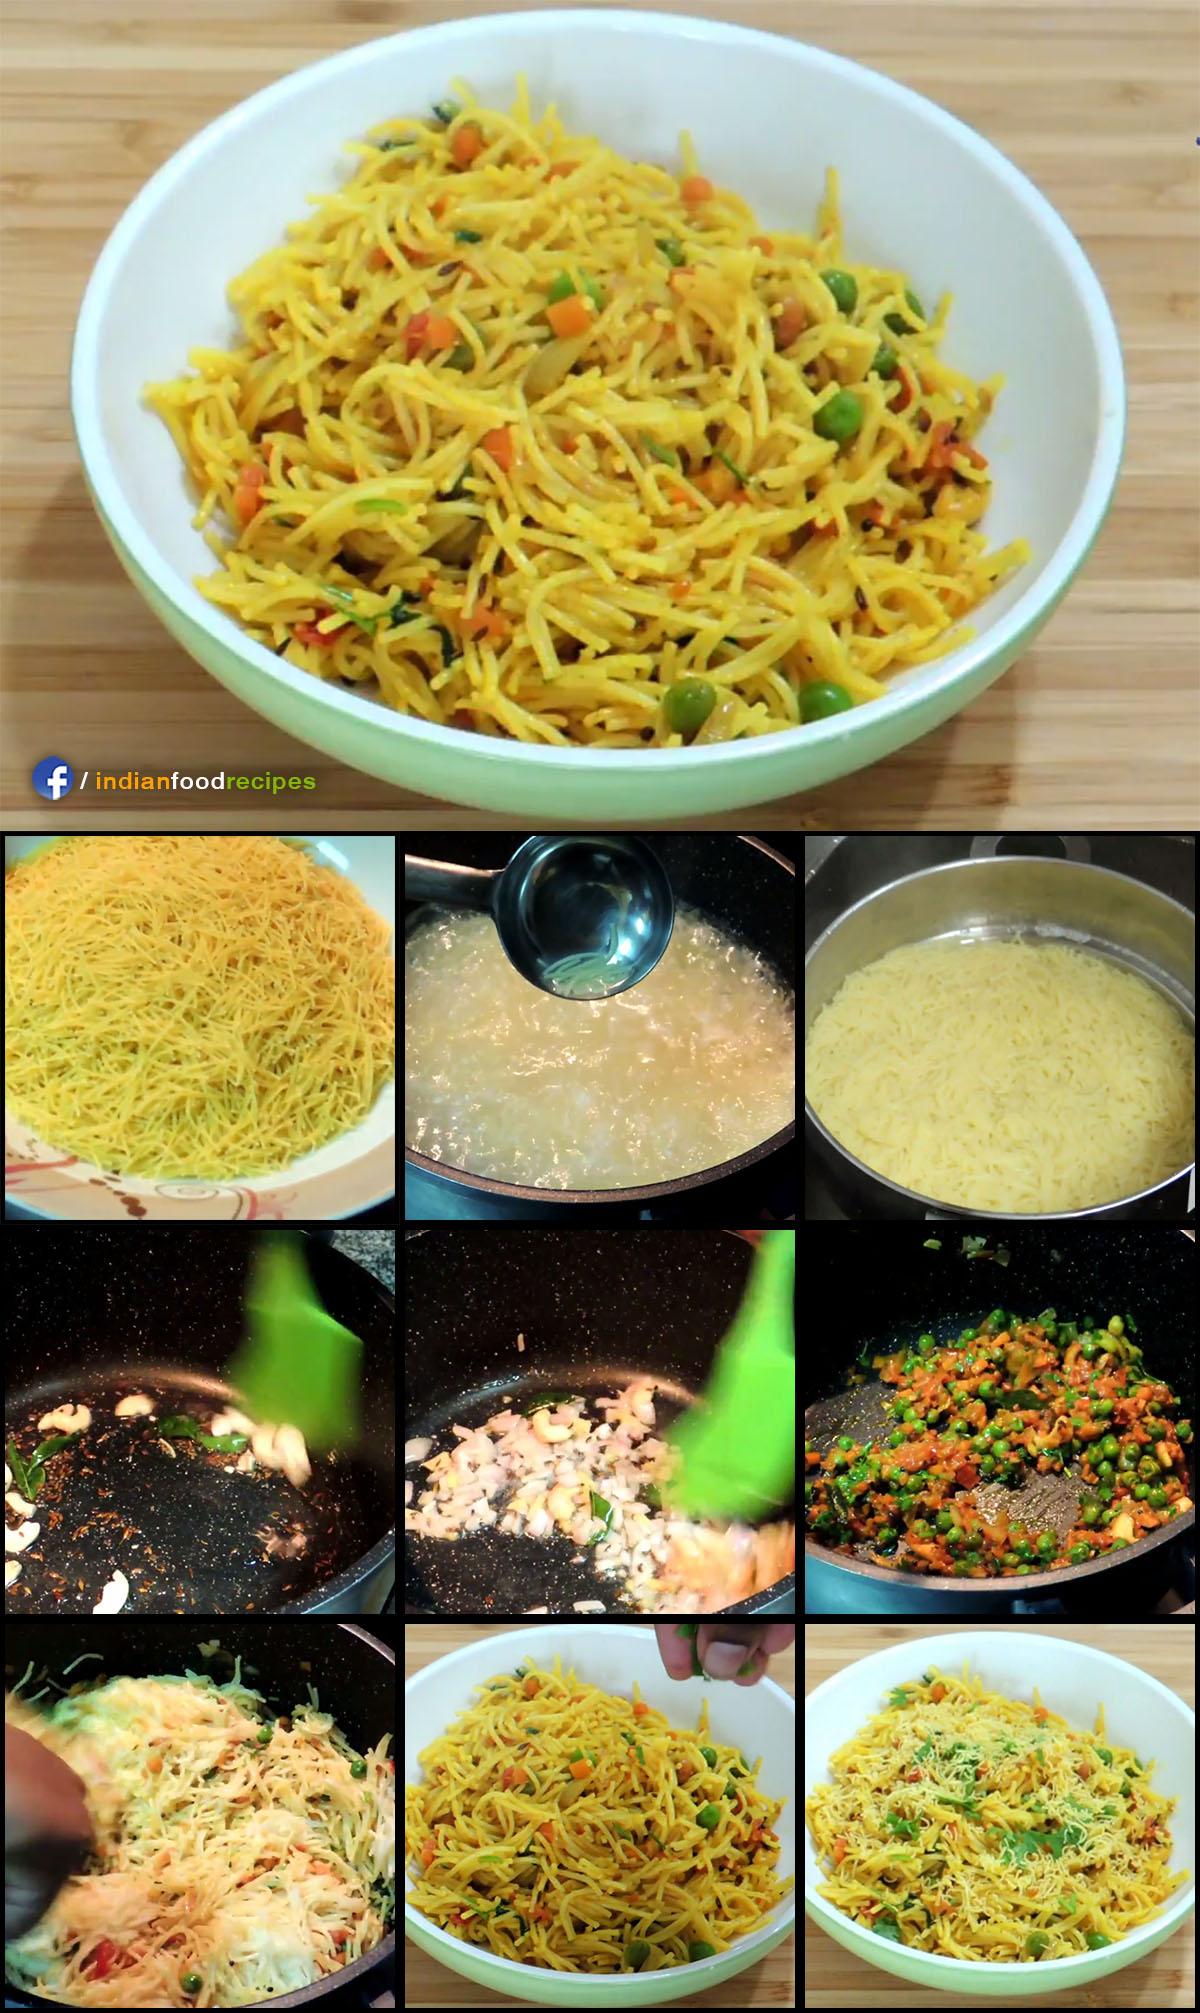 Semiya Upma Vermicelli Upma recipe step by step pictures